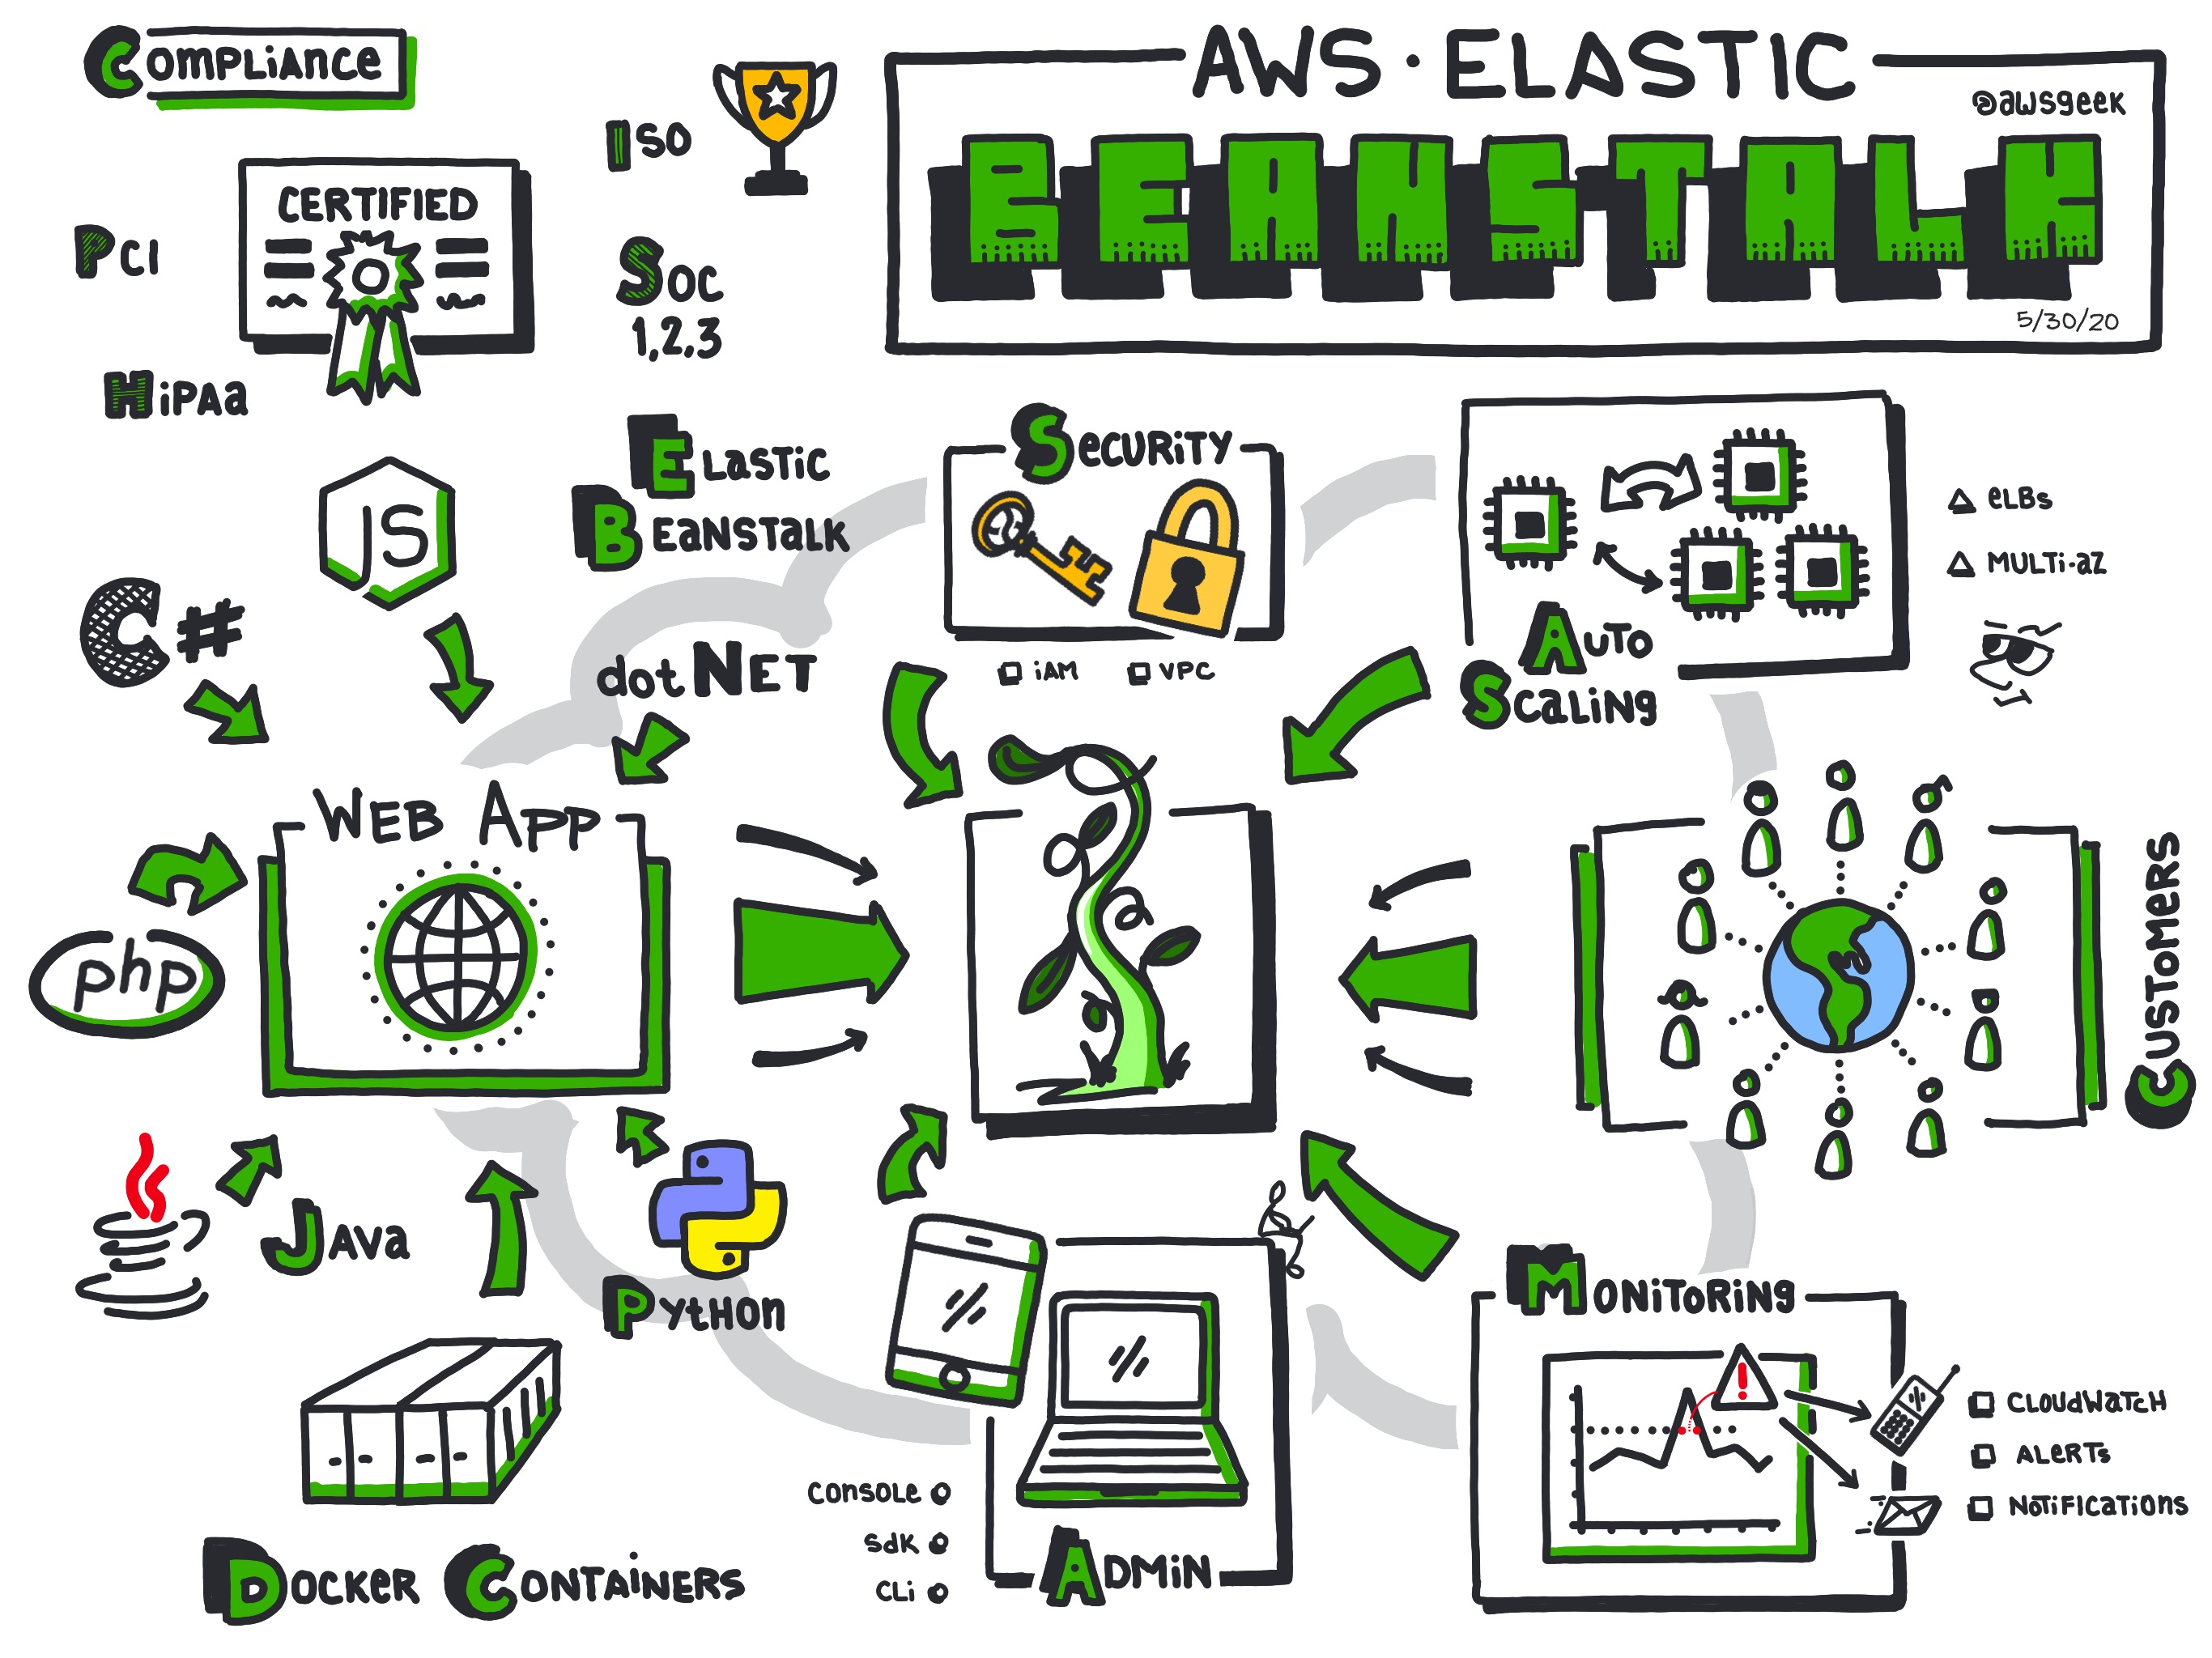 AWS-Elastic-Beanstalk.jpg